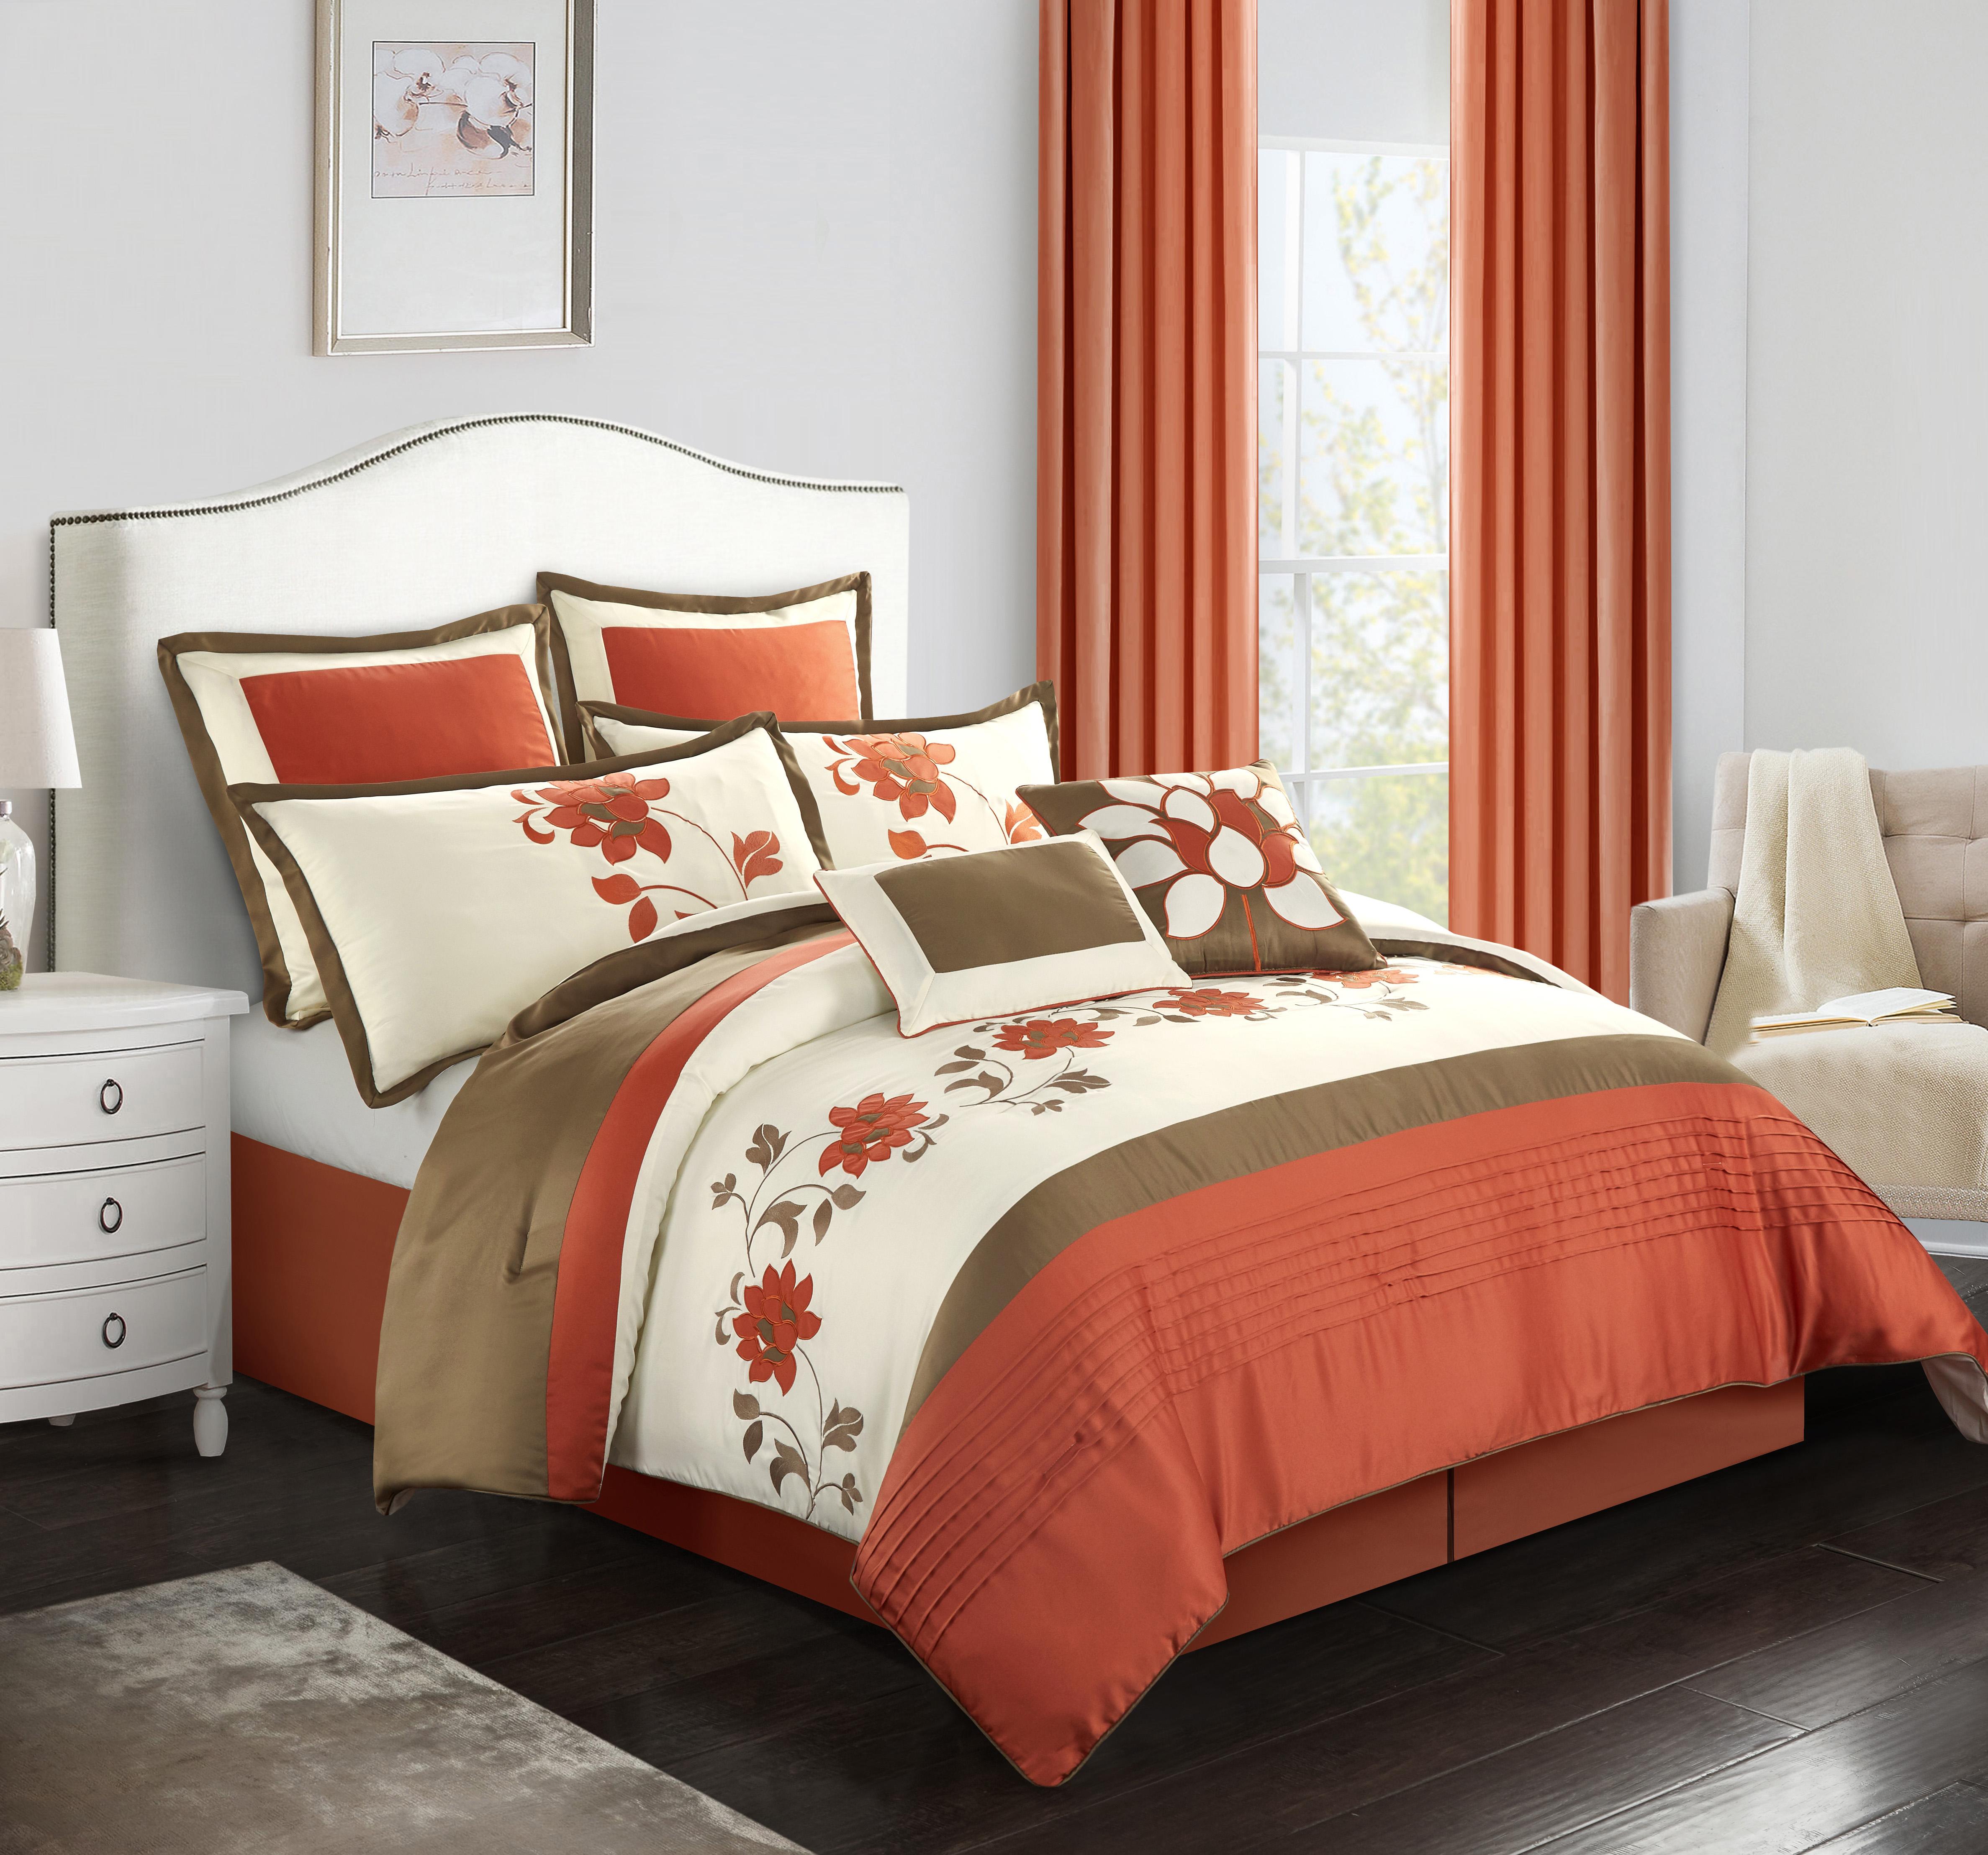 Stratford Park by Nanshing MacKenzie 8-Piece Bedding Comforter Set